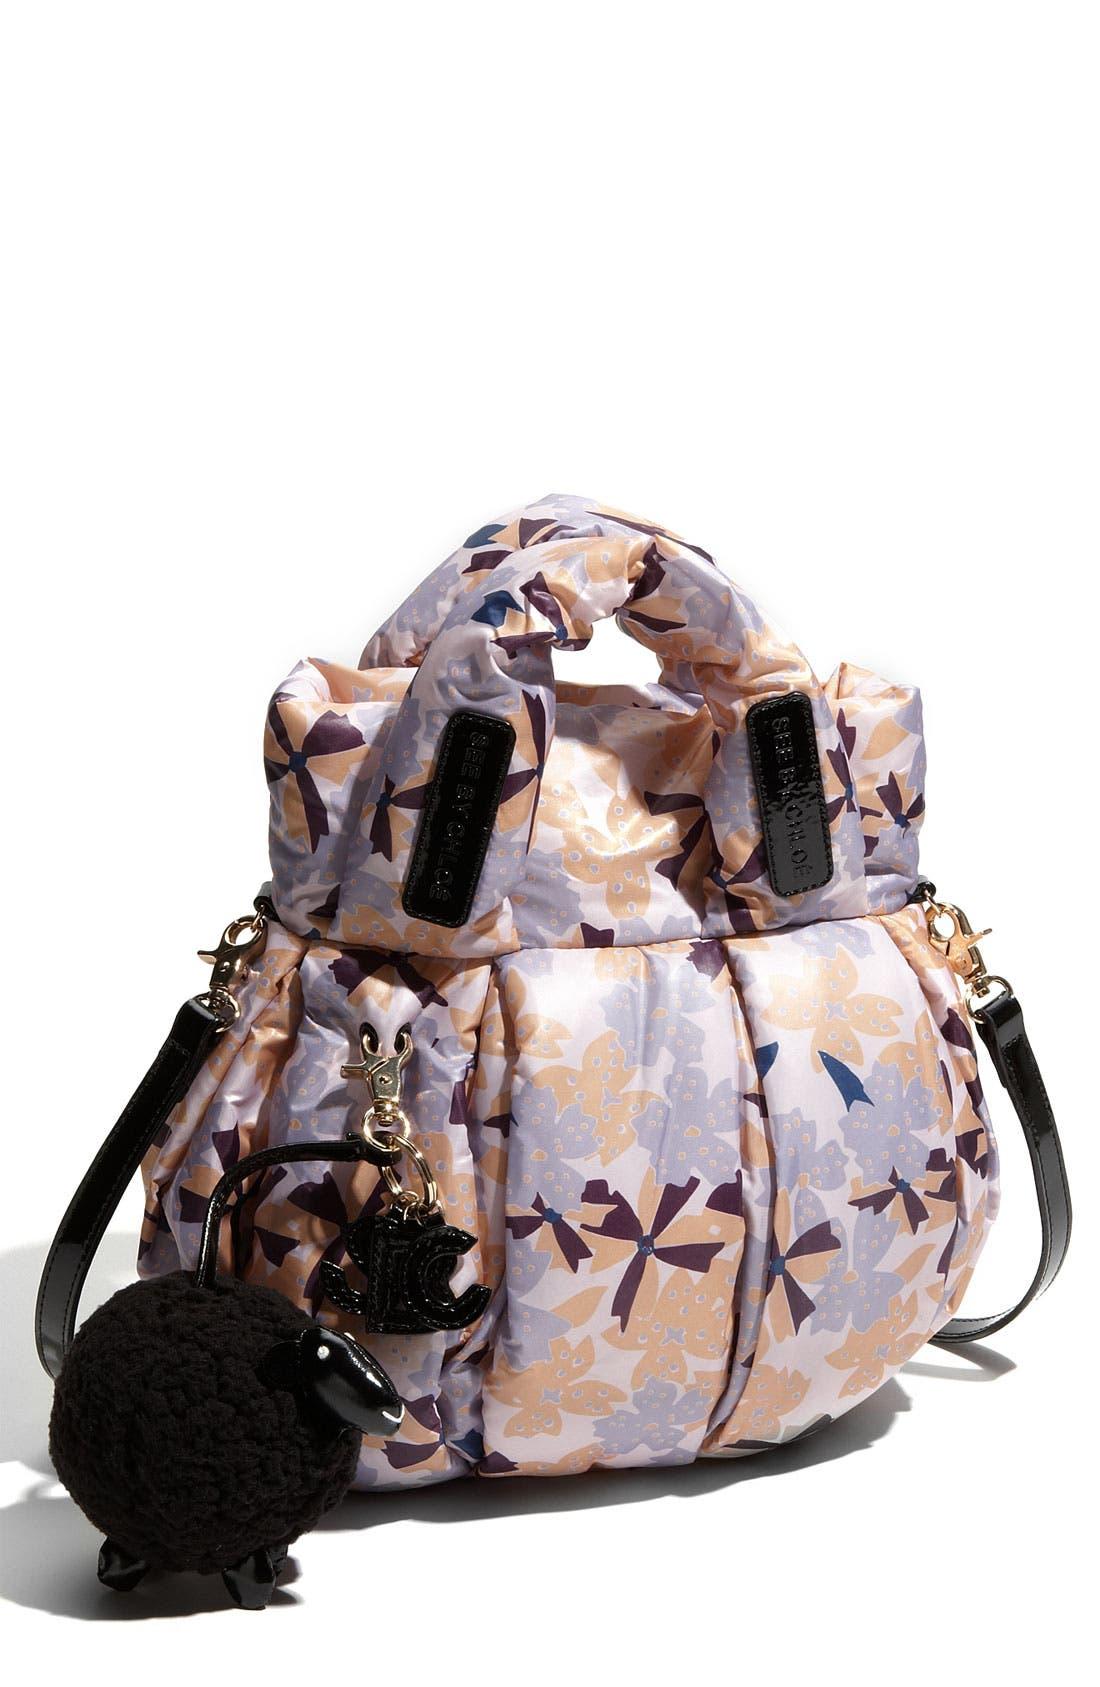 Alternate Image 1 Selected - See By Chloé 'Joyrider - Small' Crossbody Bag